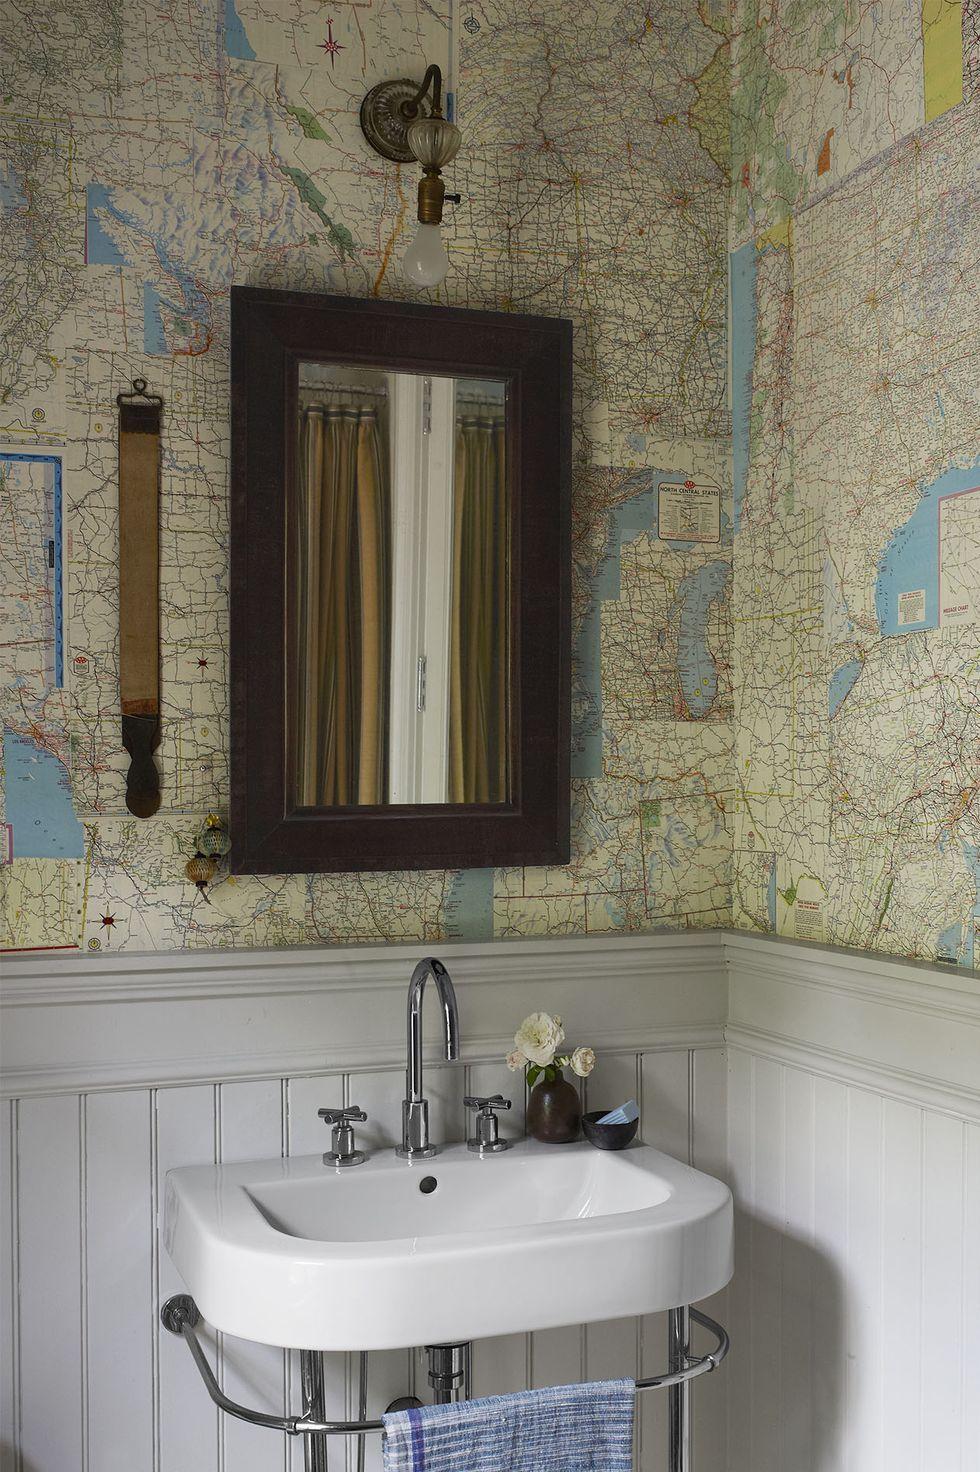 Best Bathroom Wallpaper Ideas 22 Beautiful Bathroom Wall Coverings